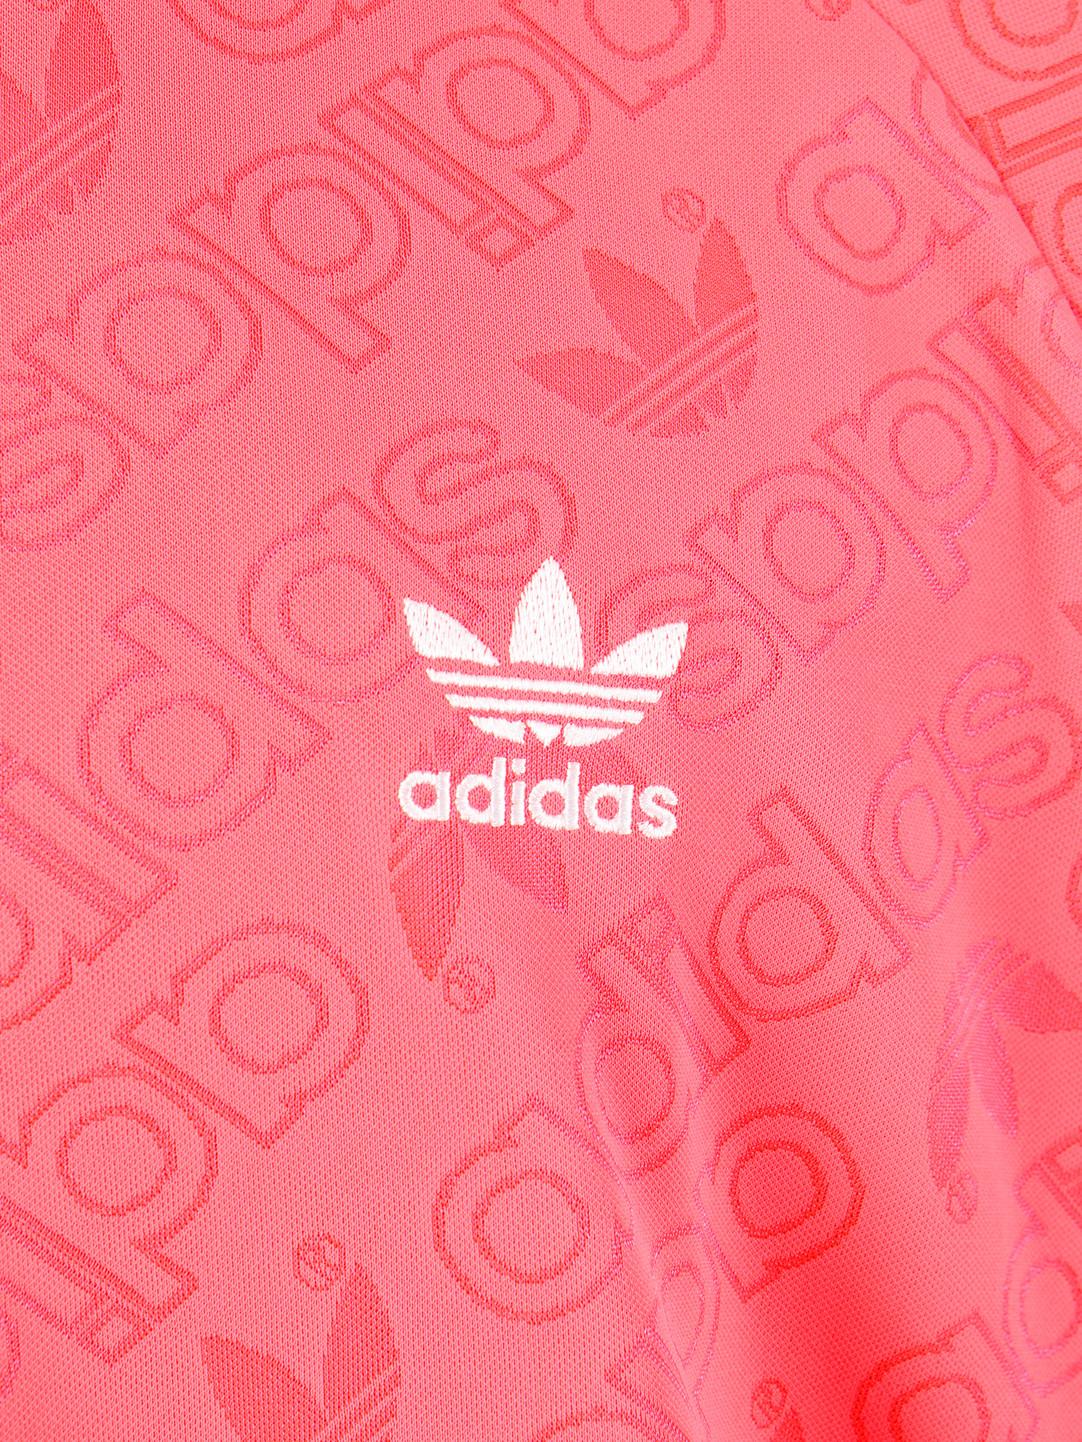 adidas adidas Mono Jersey Flared ED7039